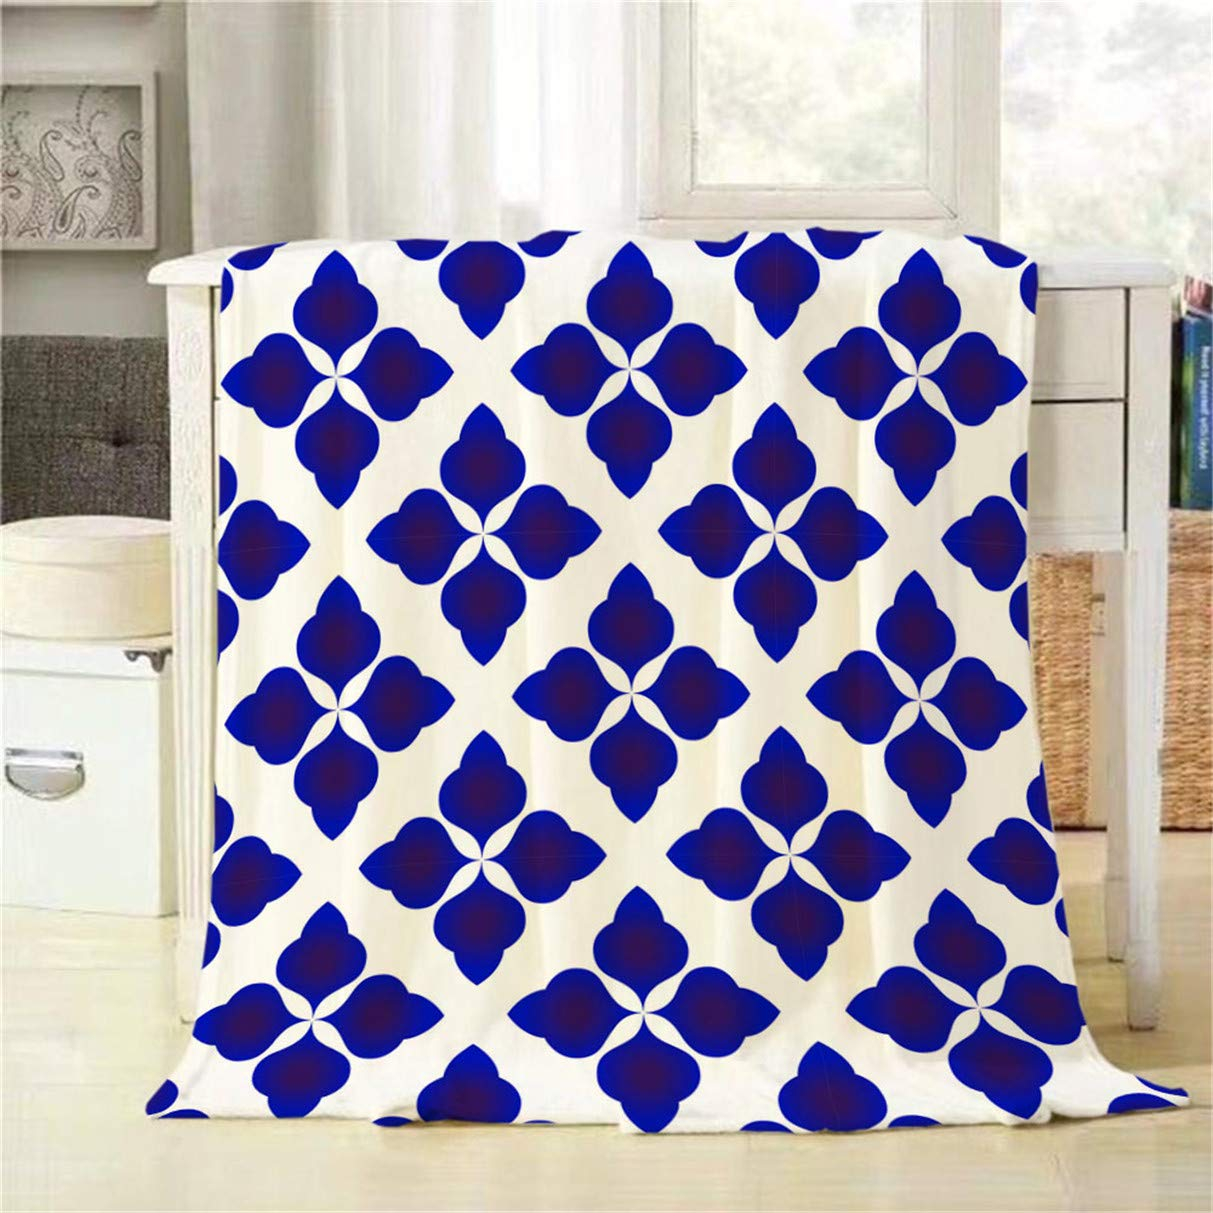 Sensational Amazon Com Mugod Throw Blanket Blue And White Abstract Uwap Interior Chair Design Uwaporg